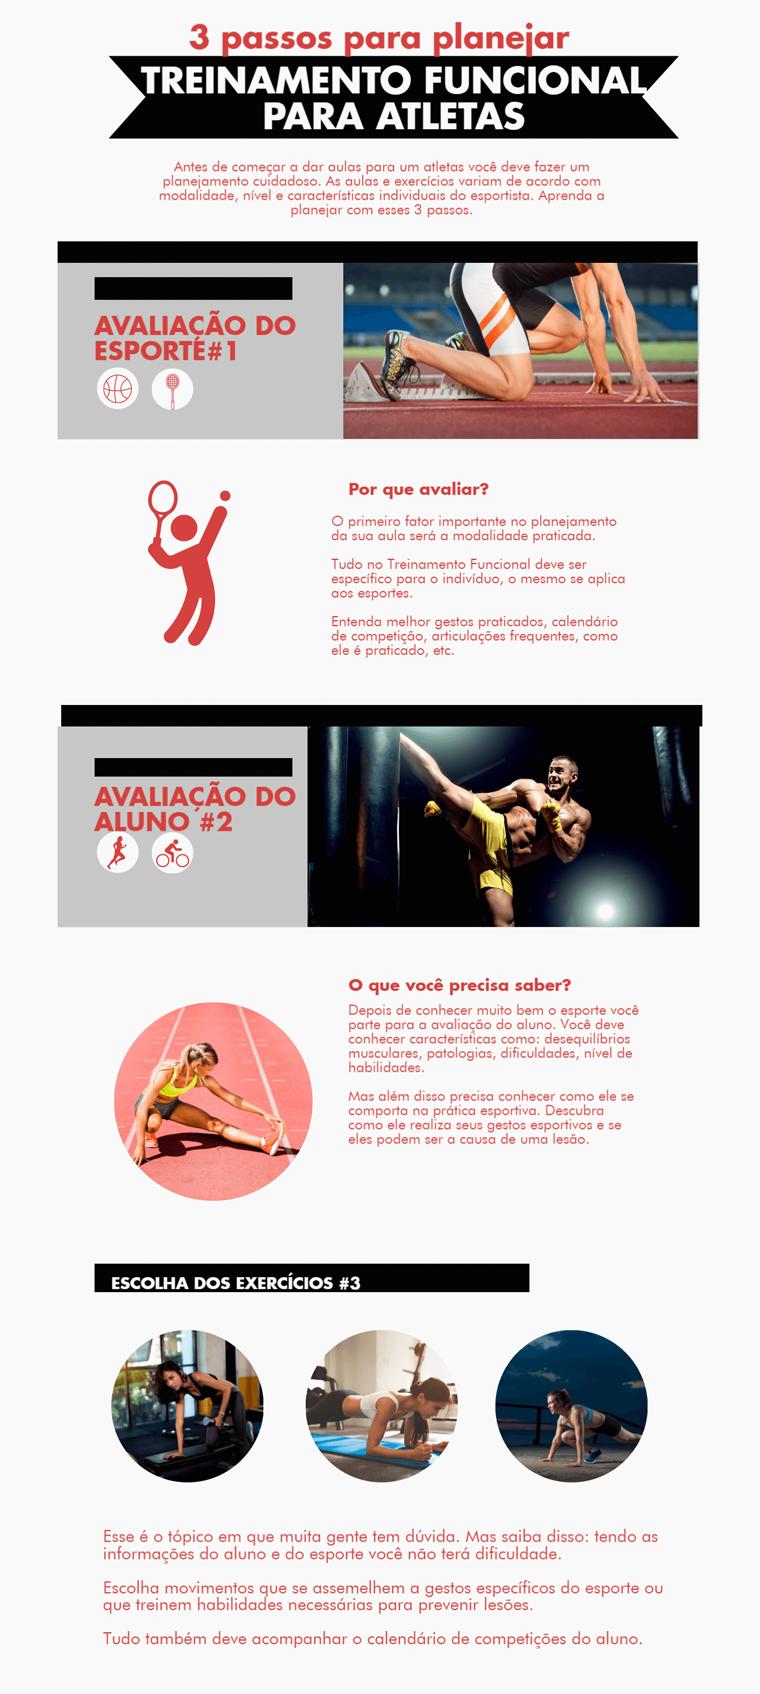 treinamento-funcional-para-atletas-infografico